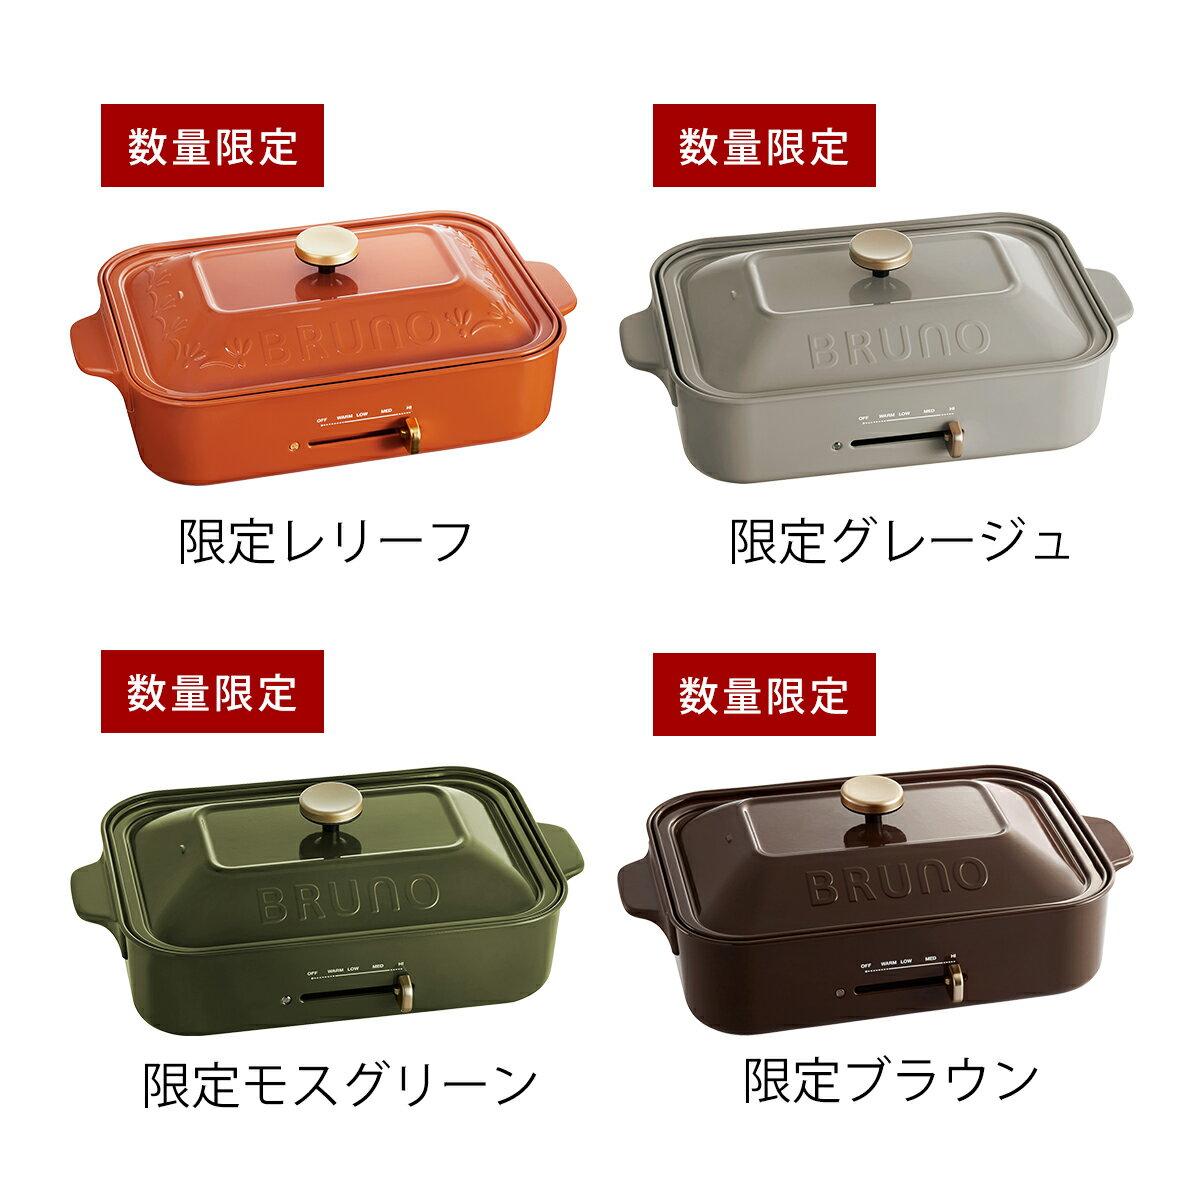 NEW色★日本名廚Masa推薦★日本BRUNO  BOE021多功能鑄鐵電烤盤(2-3人份量),附2個烤盤 -平盤+章魚燒盤-日本必買 日本樂天代購(9504*4.5)。件件免運 5